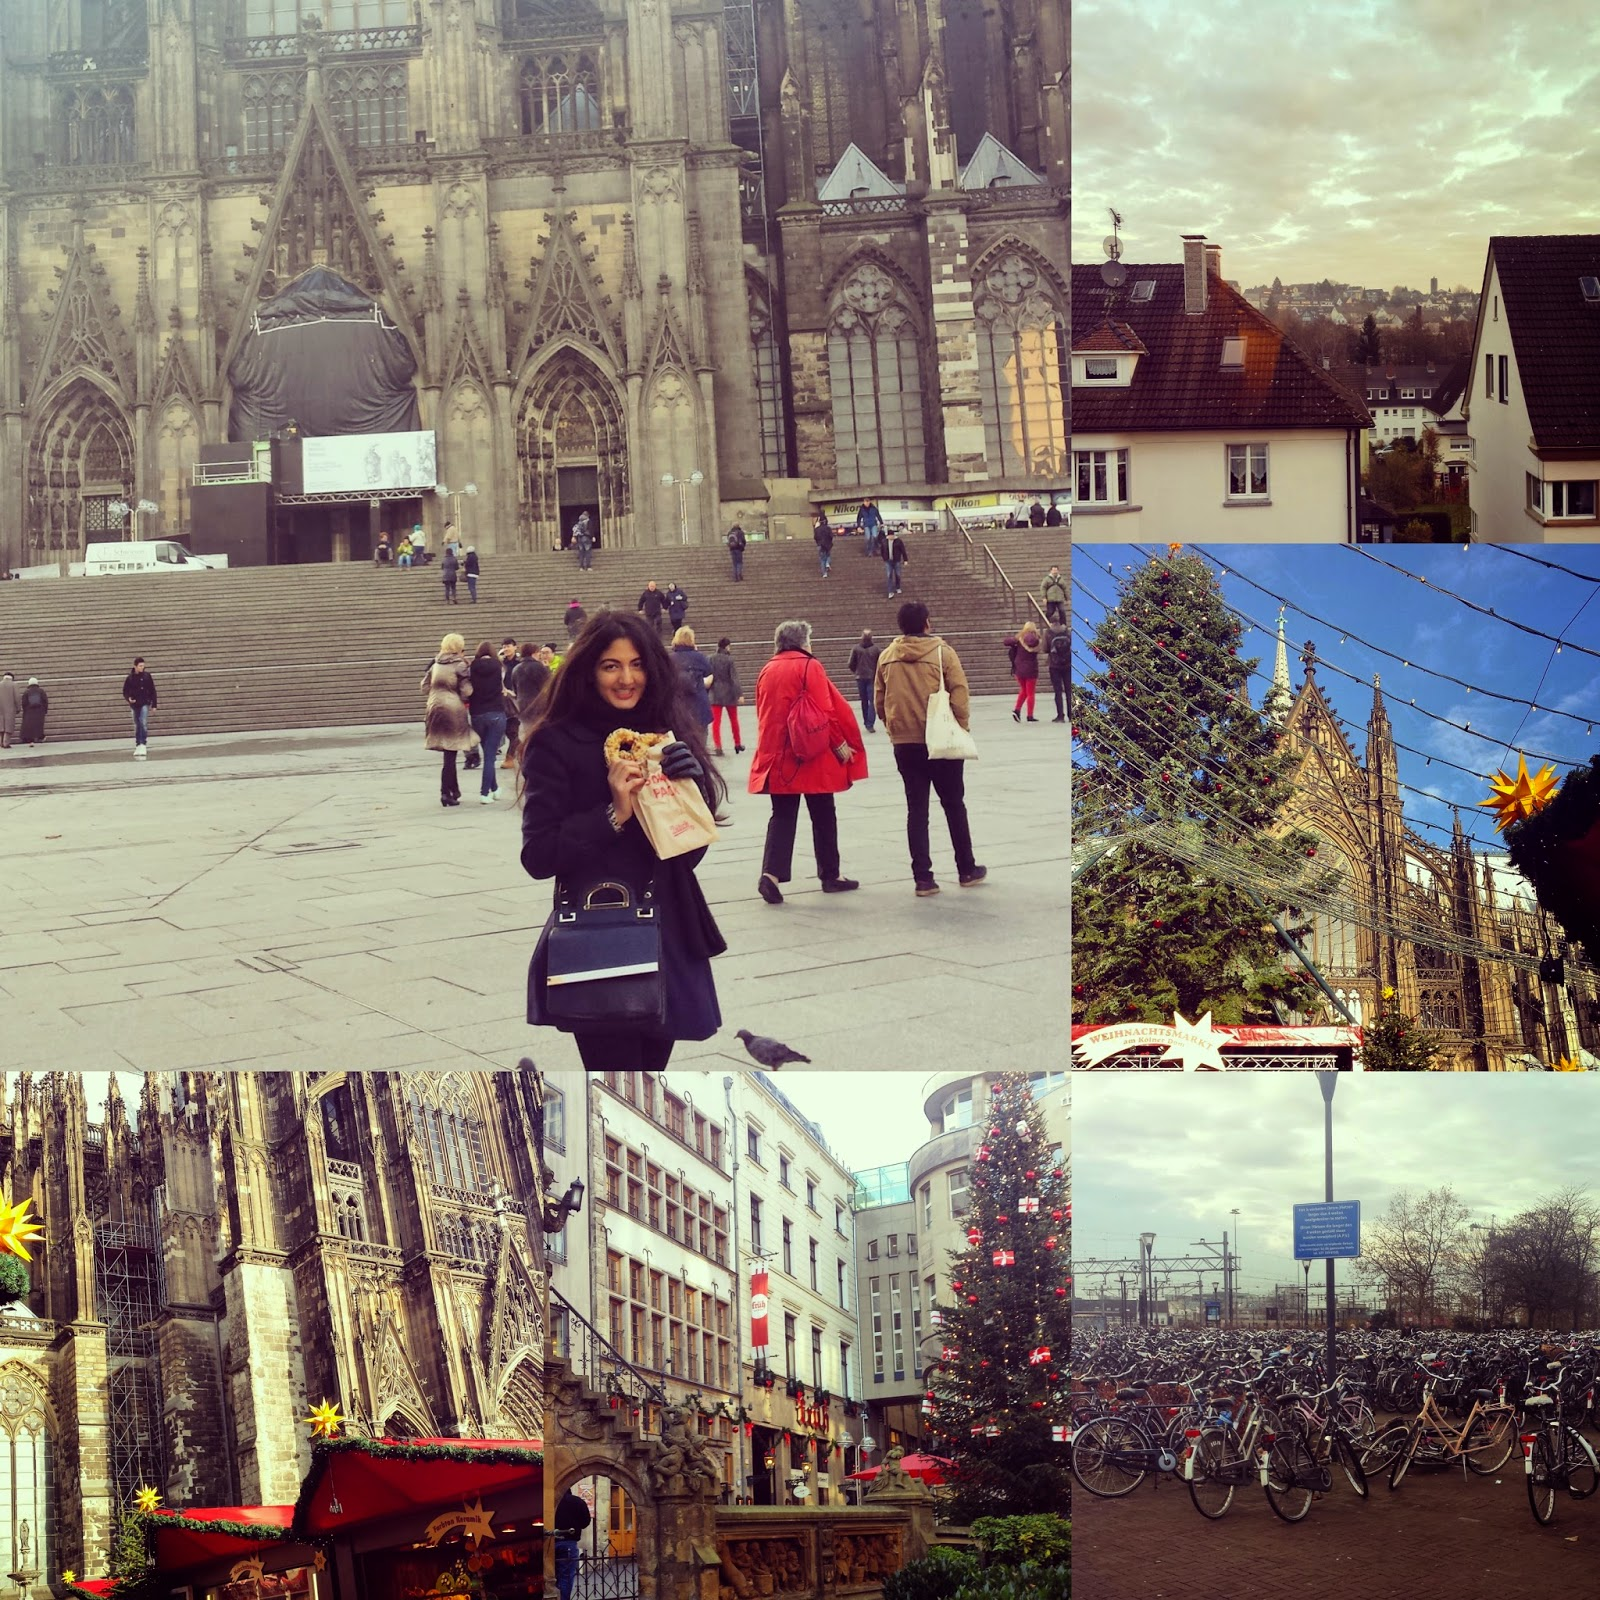 travel → Cologne/Düsseldorf Christmas markets, Germany